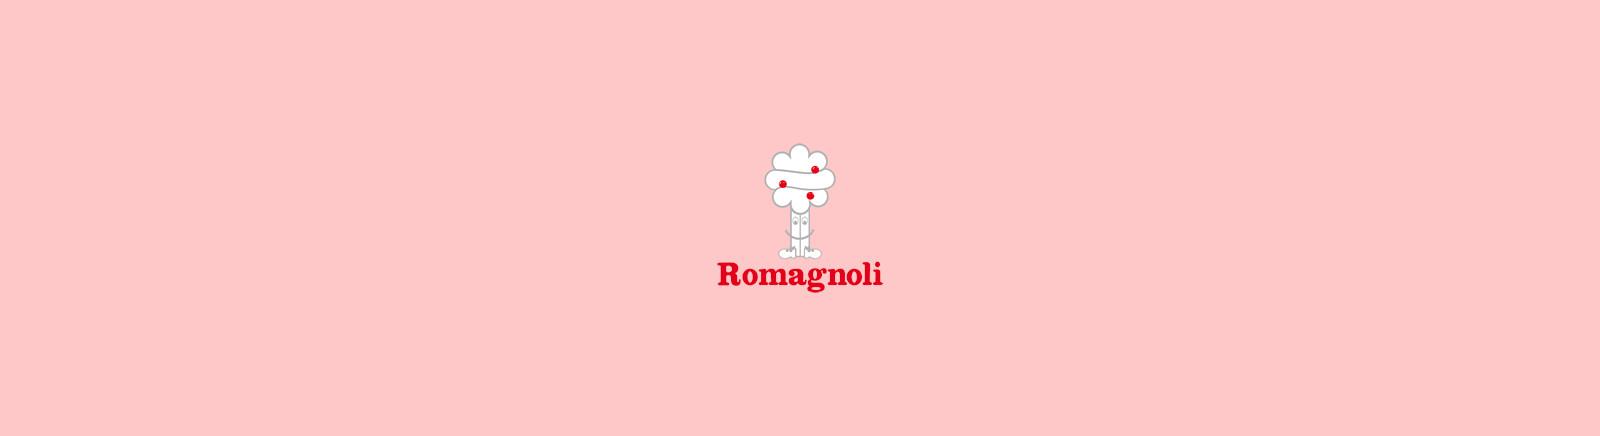 Romagnoli Markenschuhe online kaufen im GISY Schuhe Shop